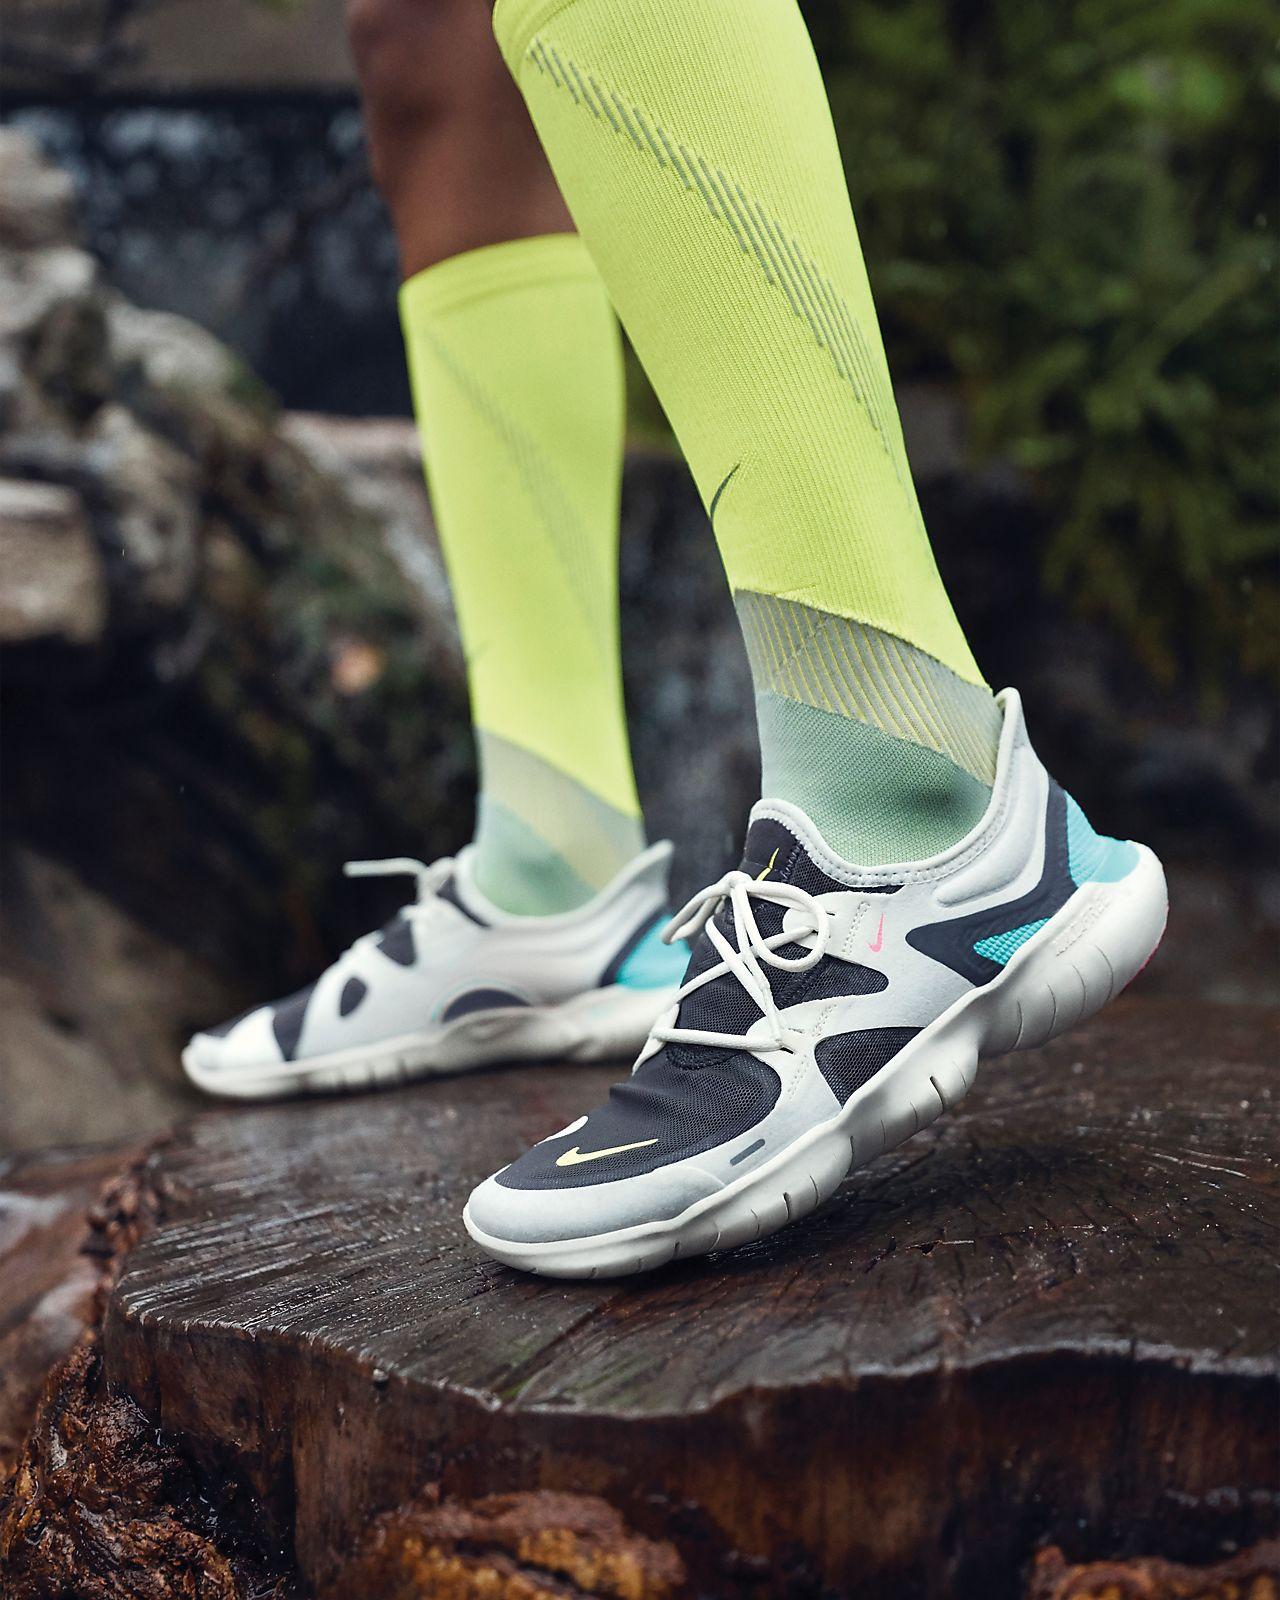 0dcbfb7b1453c Nike Free RN 5.0 Women s Running Shoe. Nike.com LU